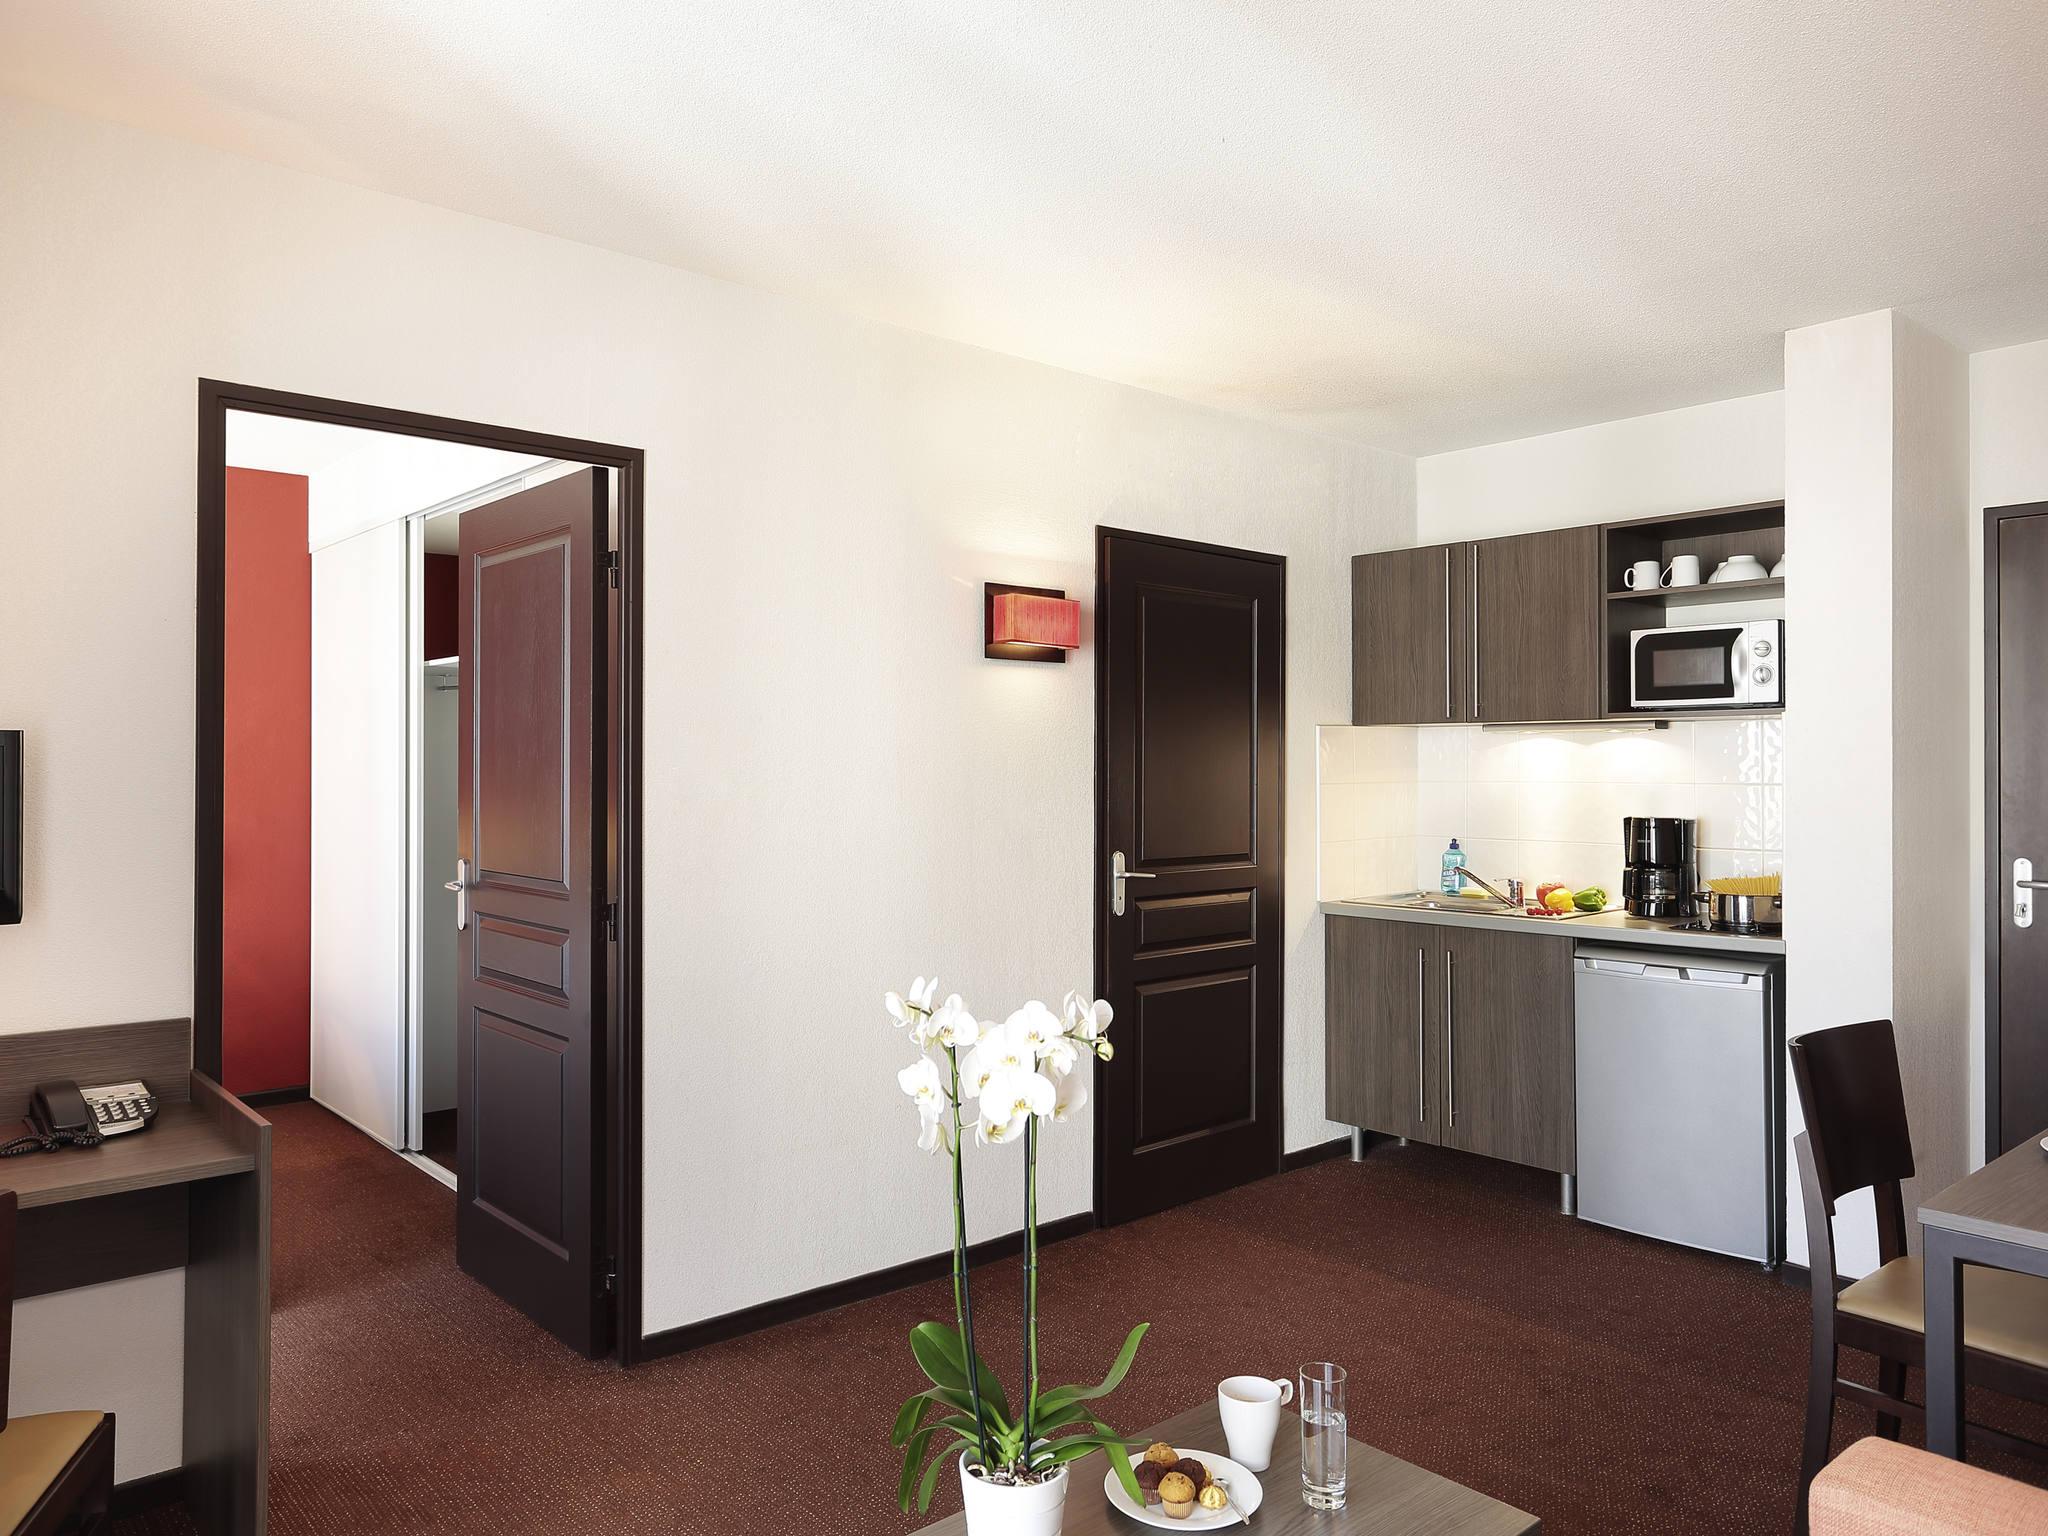 Hotel – Aparthotel Adagio access Nîmes